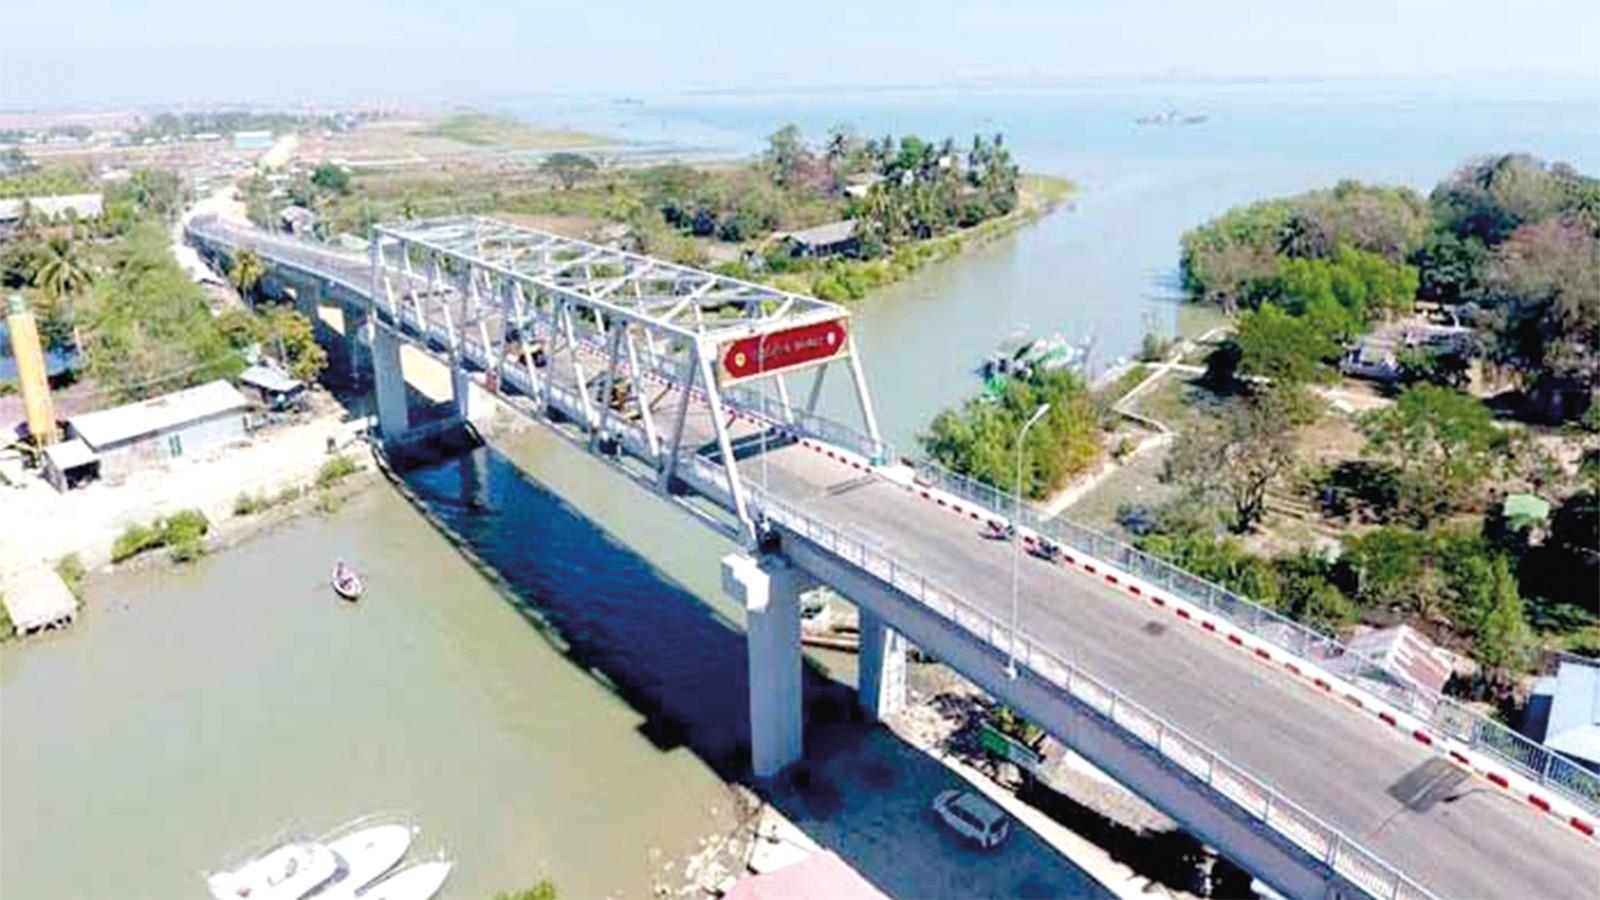 Hset Yoekya Creek Bridge.PHOTO: Tin Tun (IPRD)